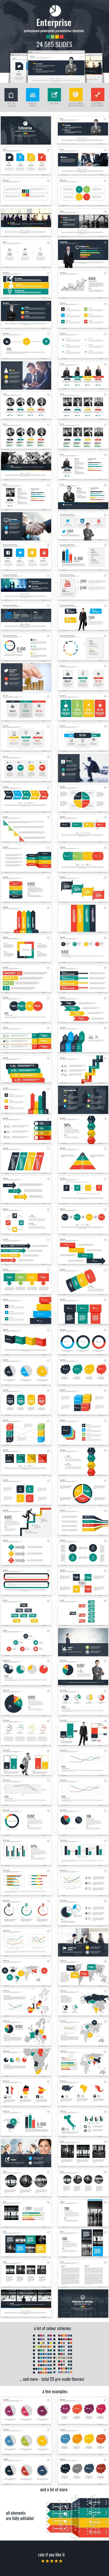 Enterprise Powerpoint Presentation Tempalte #design #slides Download: http://graphicriver.net/item/enterprise-powerpoint-presentation-template/12619388?ref=ksioks